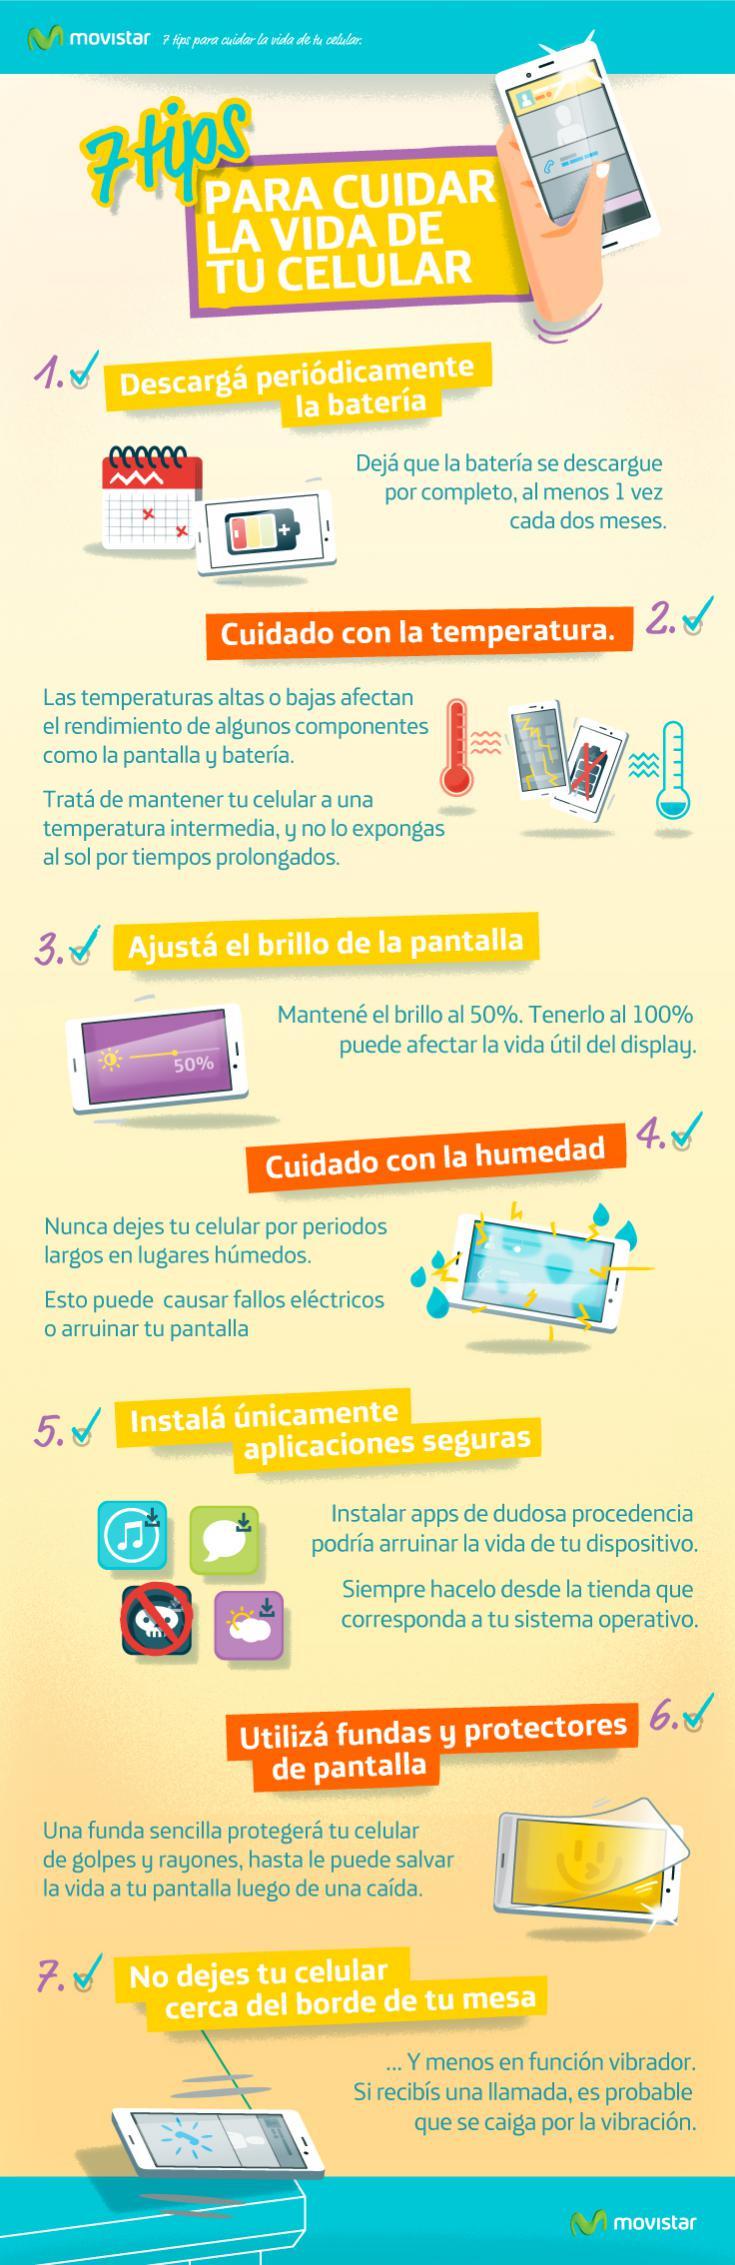 7 consejos movil - infografia